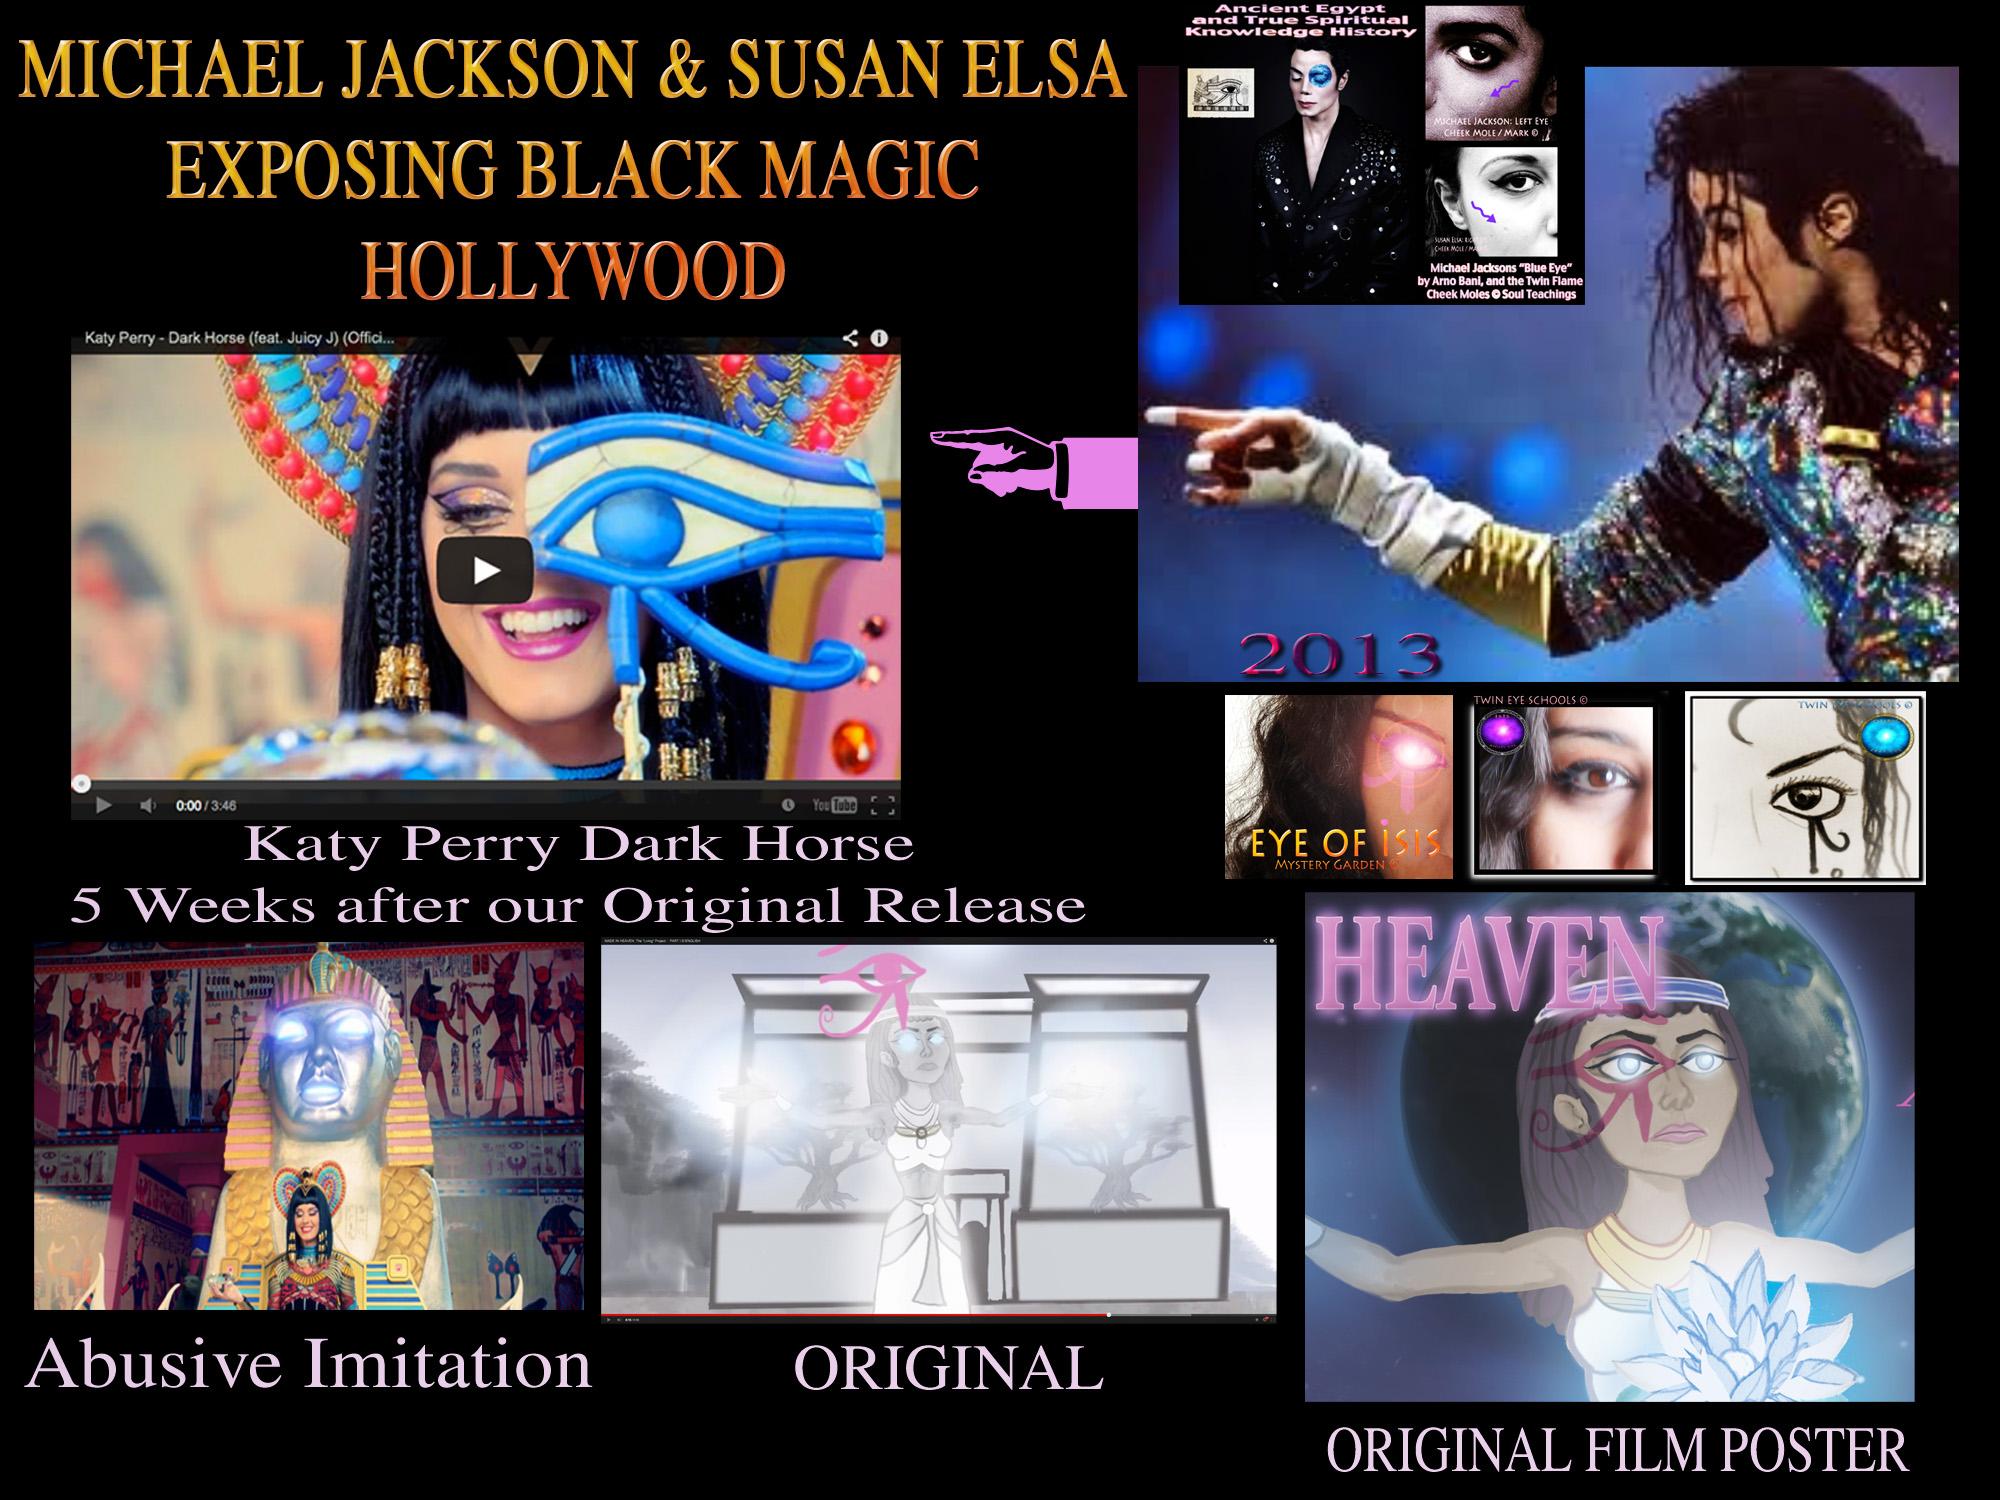 Michael Jackson Susan Elsa exposing Black Magic Hollywood Katy Perry Dark Horse Abusive Copyright and Film Rights Infringement